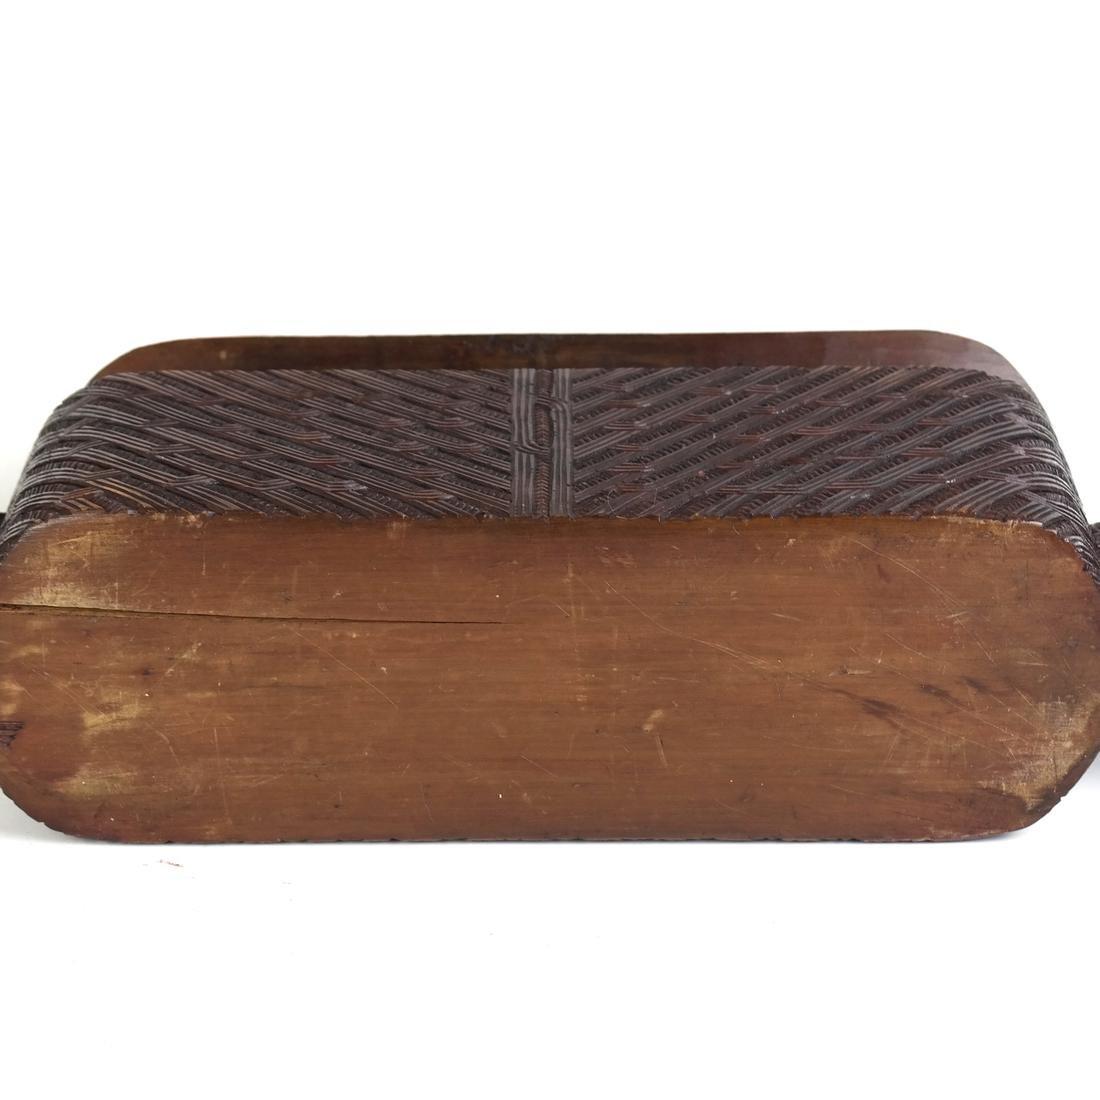 Maori Carved Hardwood Box - 7